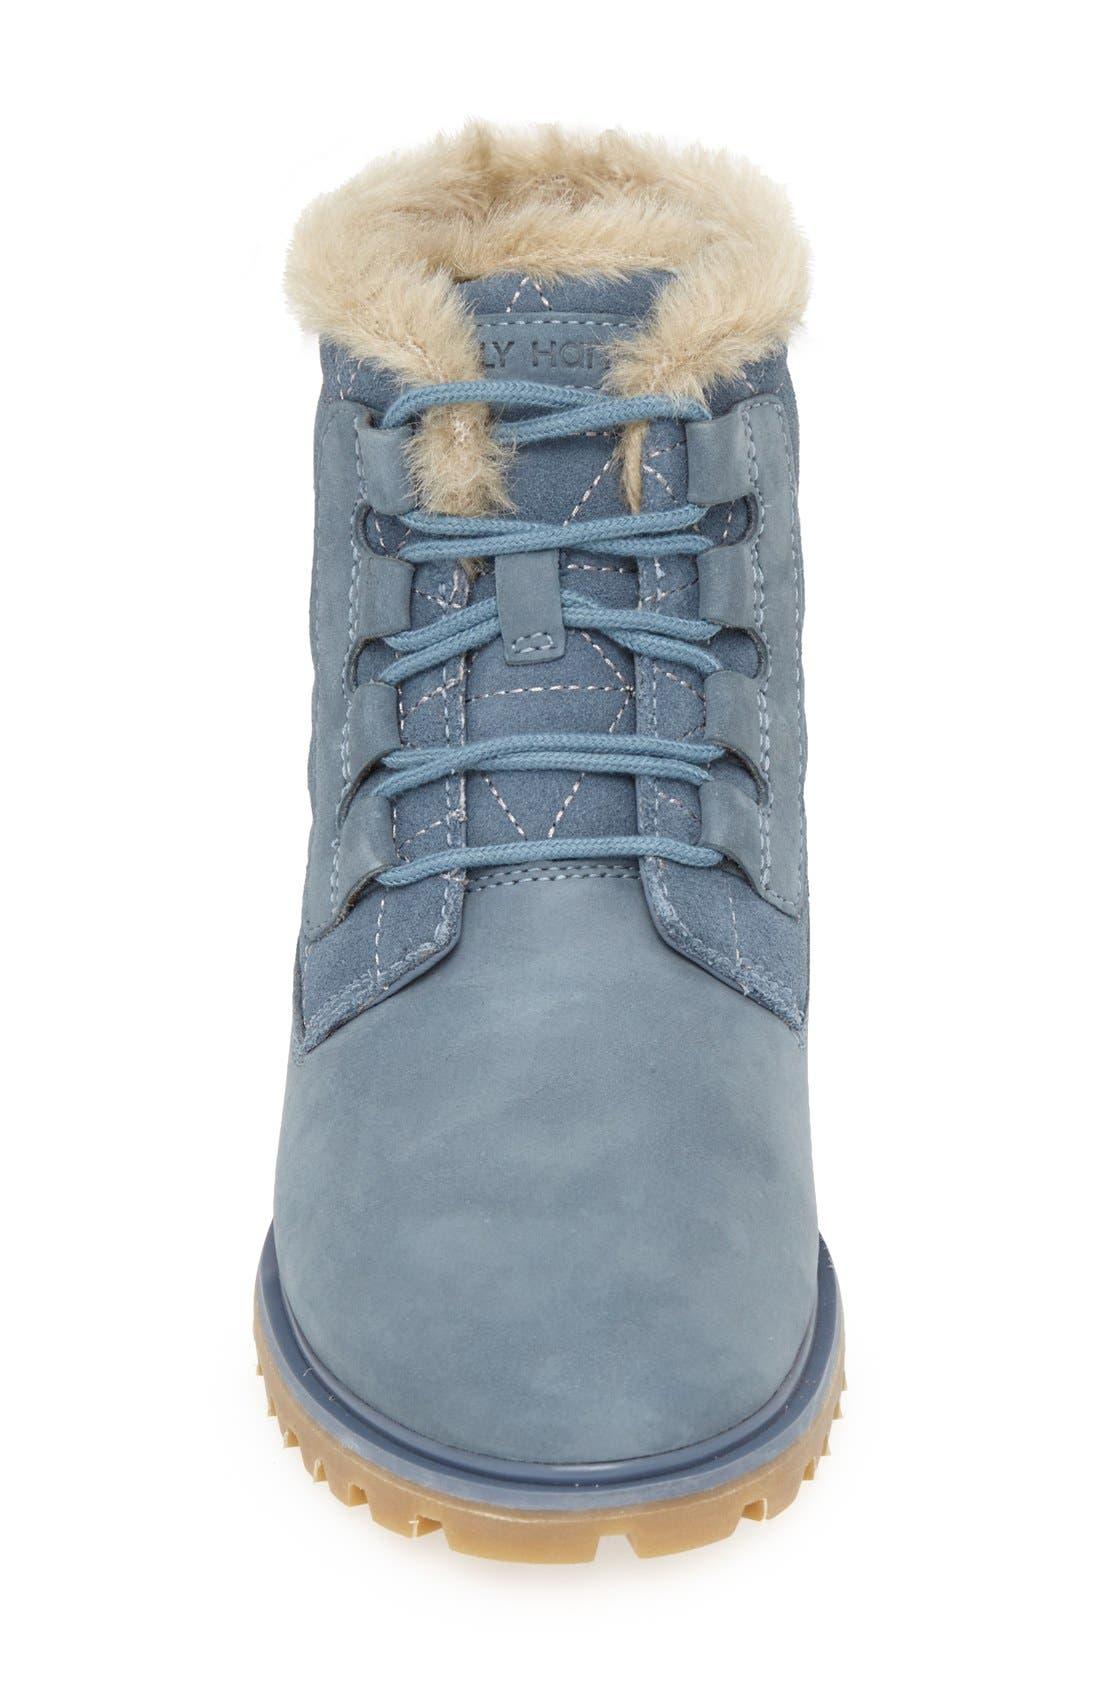 'Vega' Waterproof Leather Boot,                             Alternate thumbnail 3, color,                             Arctic Blue/ Natural